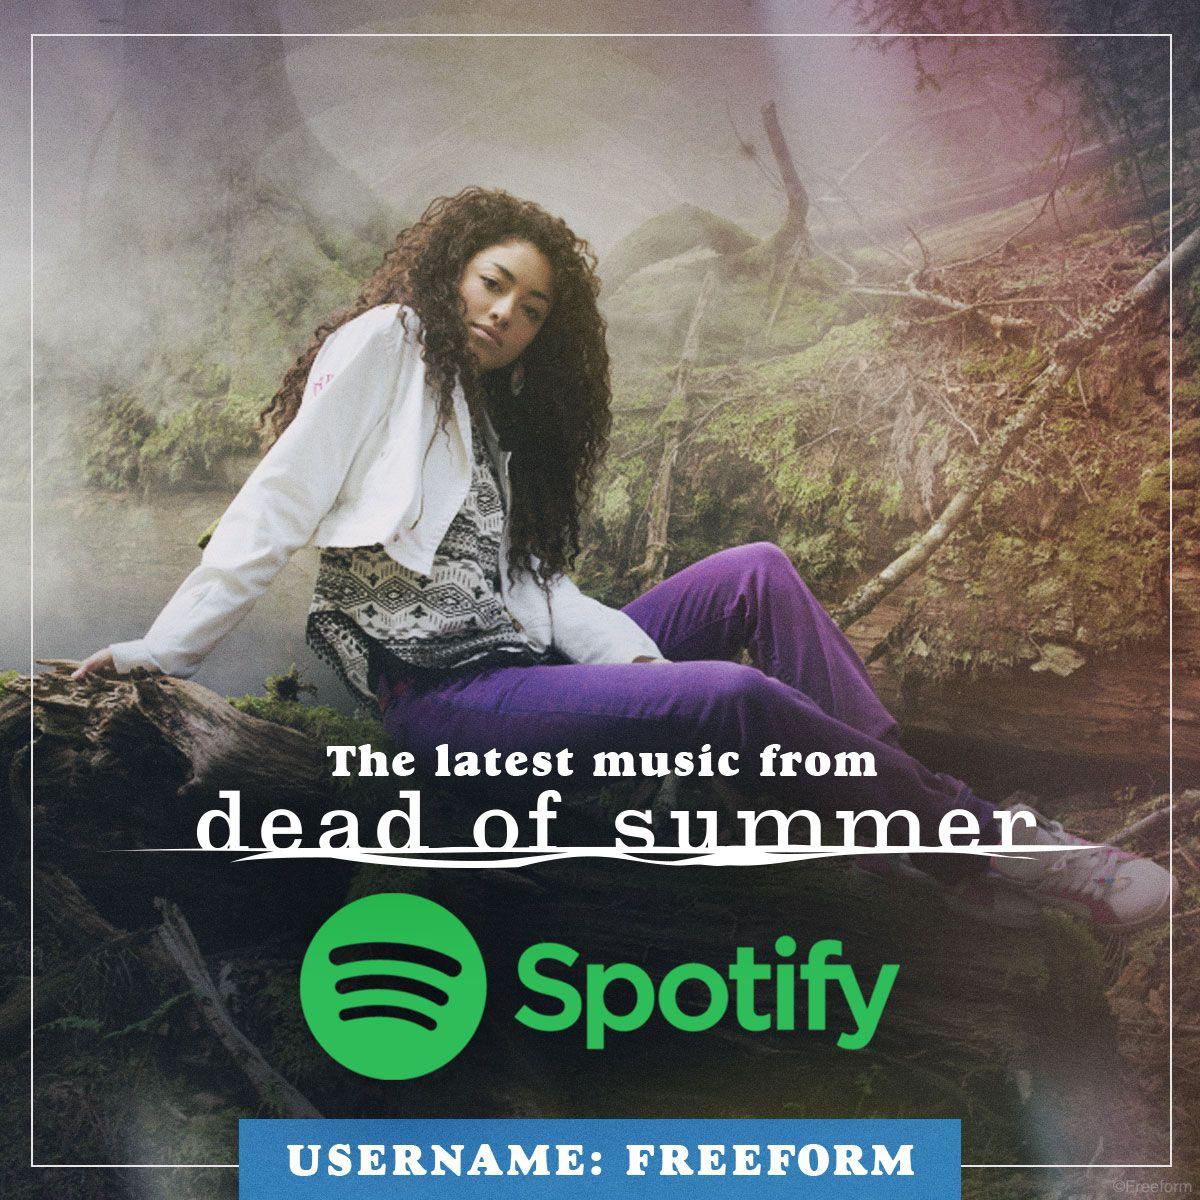 Check out Jessie's playlist on Spotify! http://open.spotify.com/user/abcfamily/playlist/6kKt3SpgChlWzN2asSUQeH